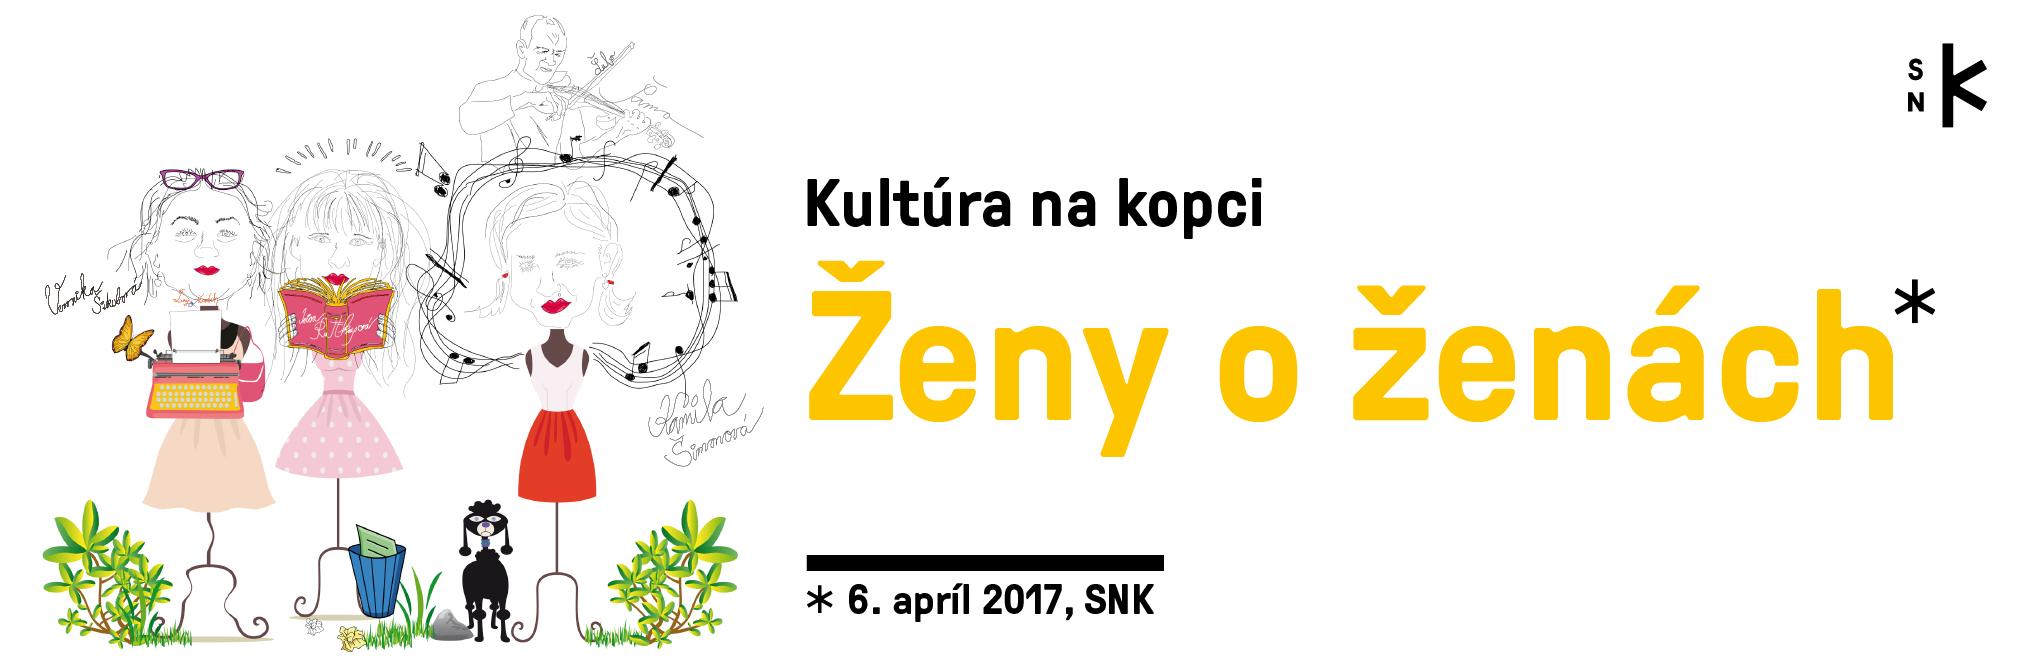 Slovenská národná knižnica - Ženy o ženách (Kultúra na kopci)